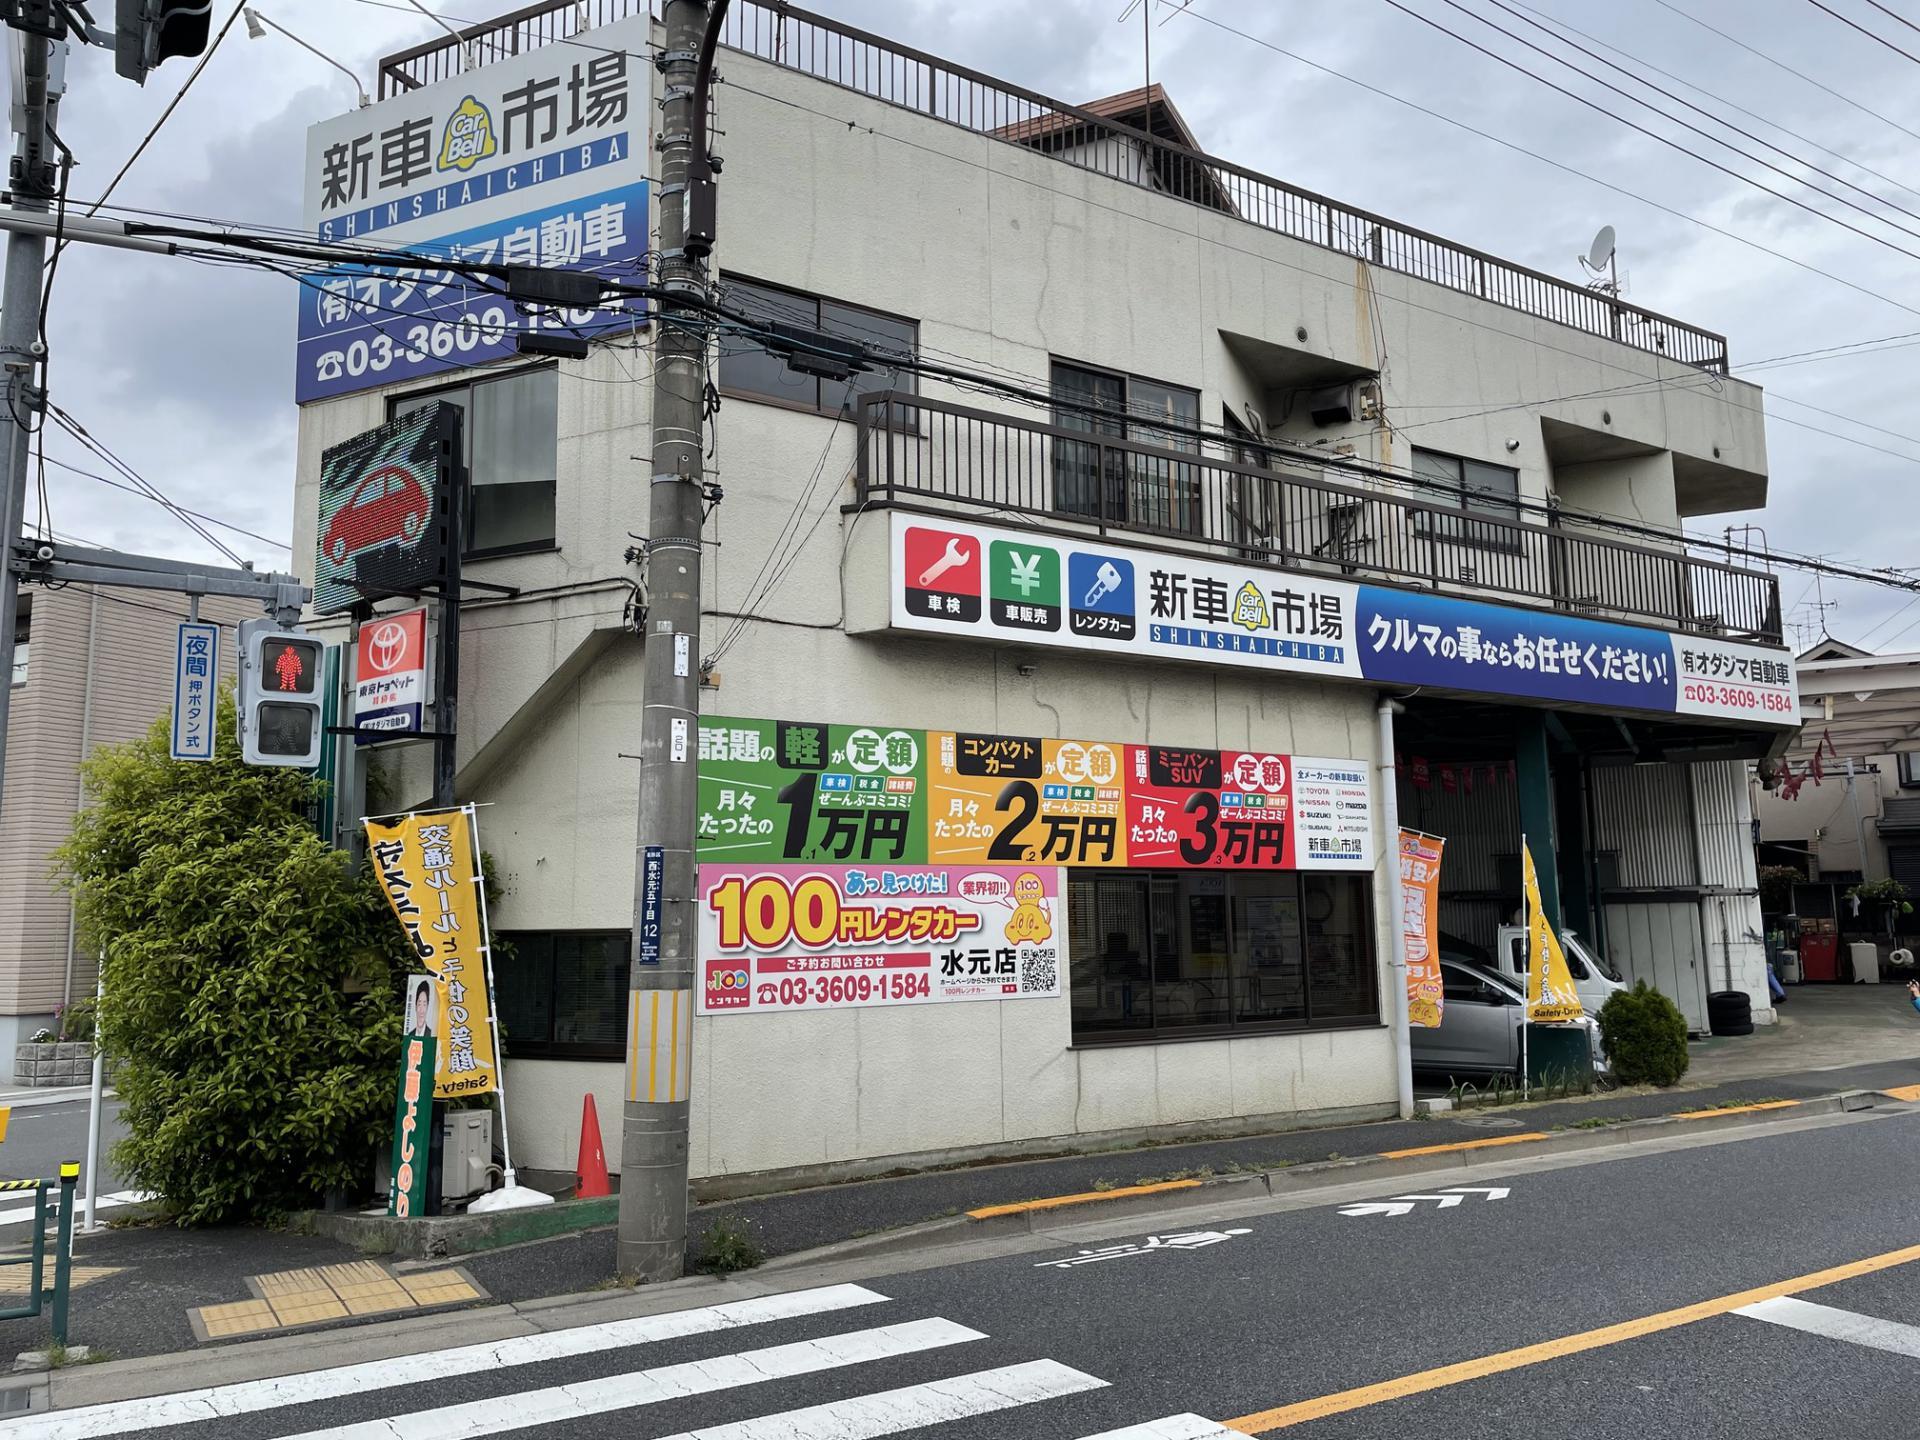 有限会社オダジマ自動車 新車市場 水元店